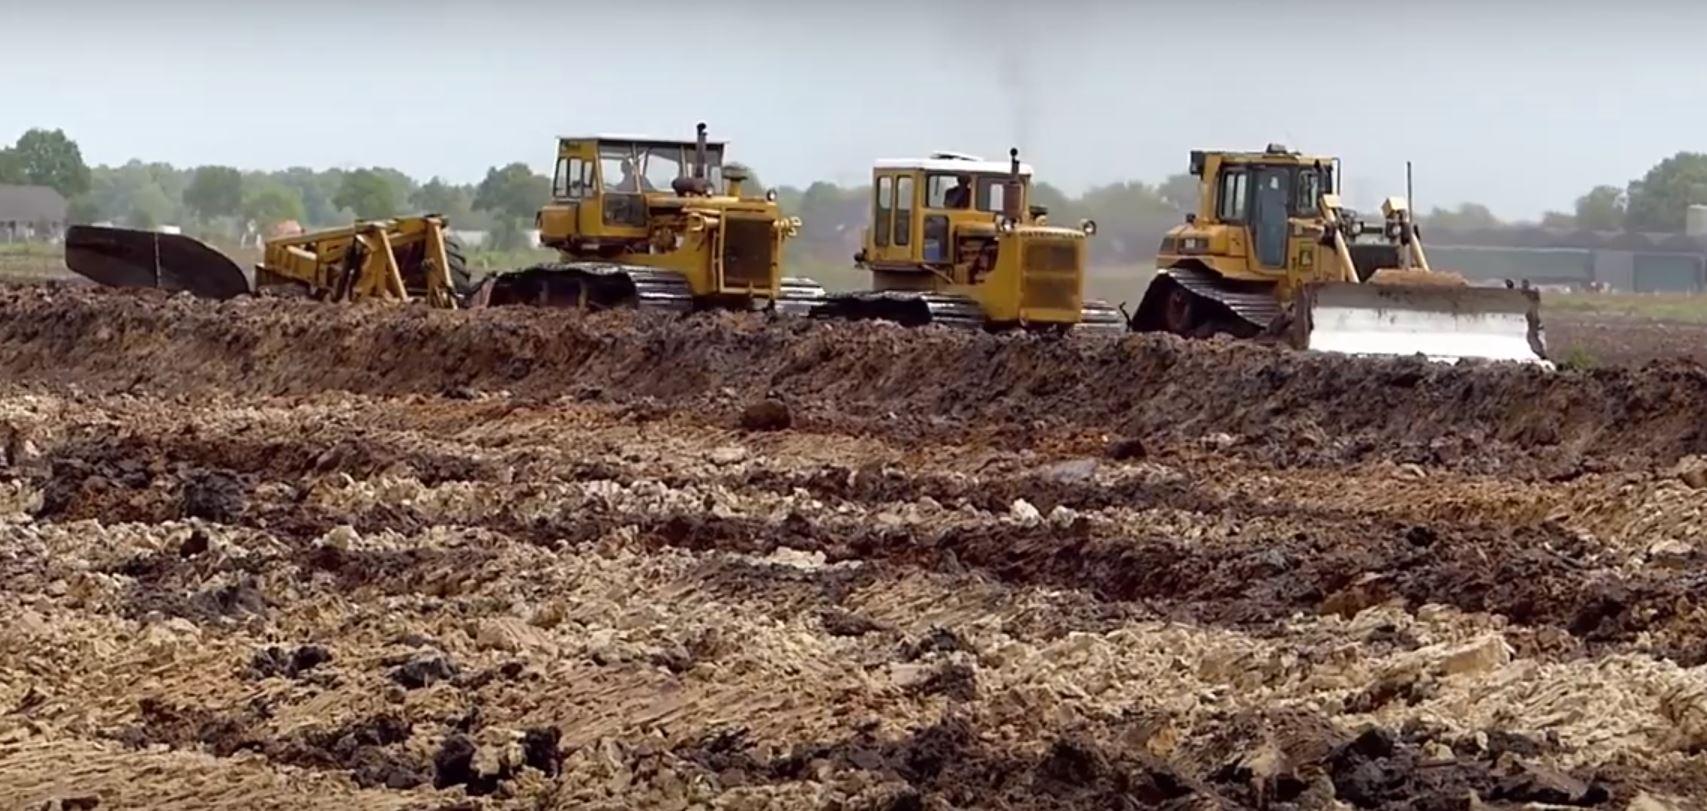 World's Biggest Plow Goes 2M Deep, Requires Three Tractors